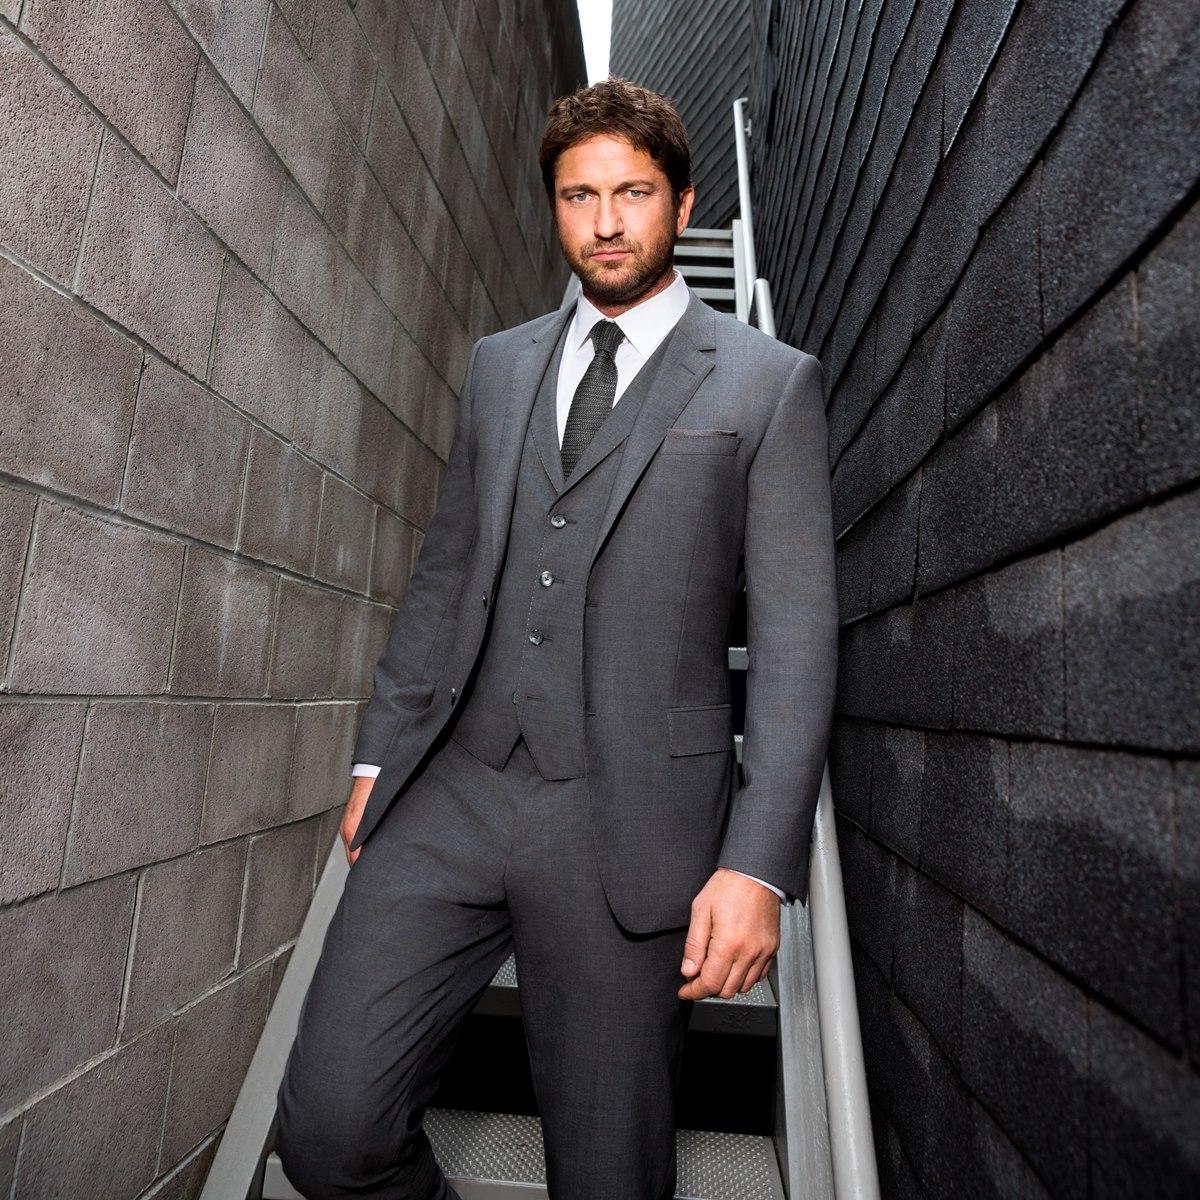 Gerard Butler Hugo Boss Suit 001